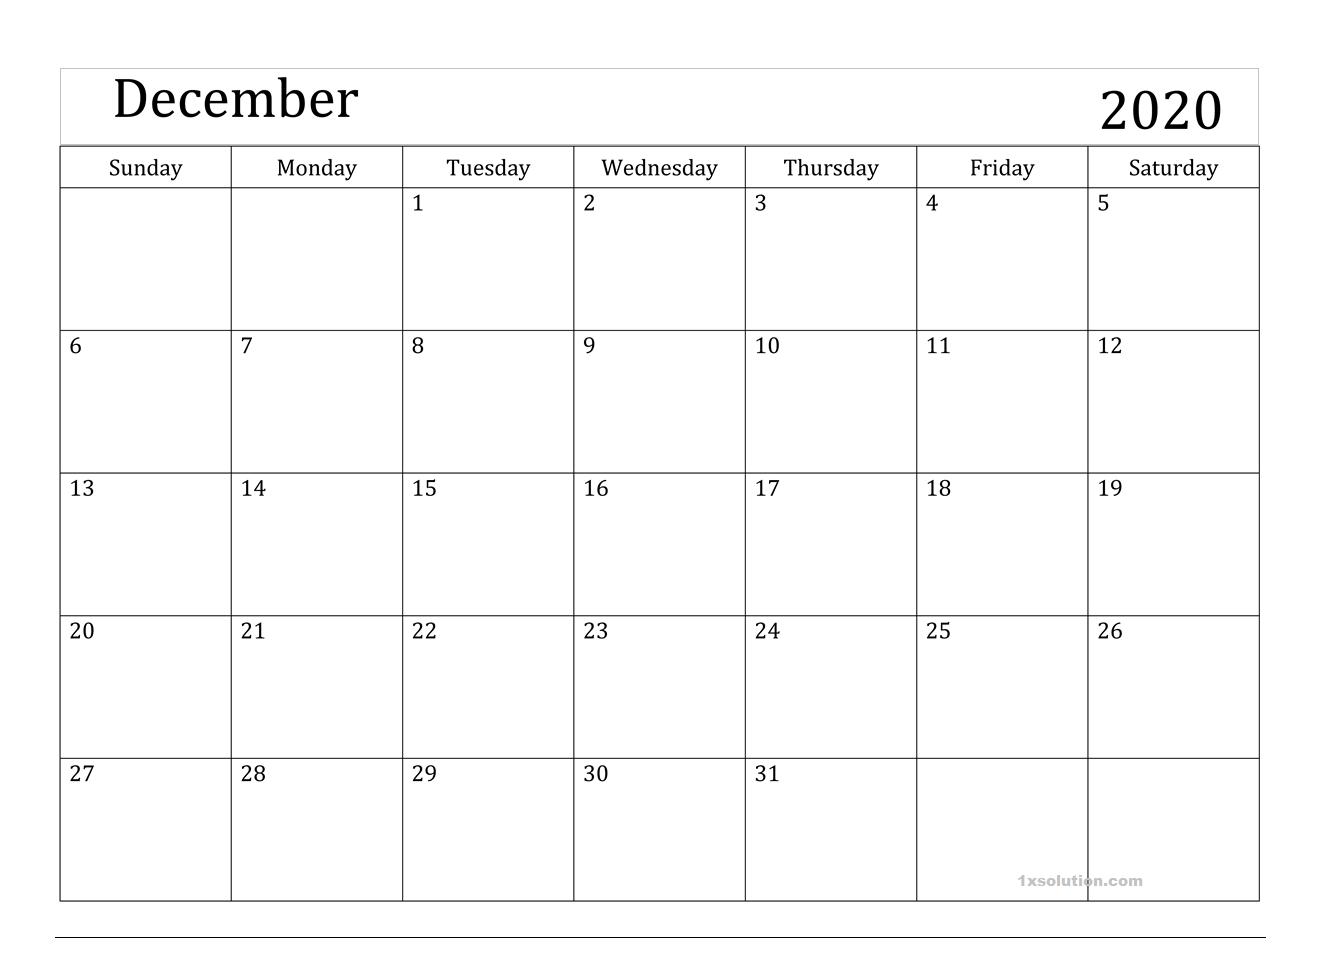 December 2020 Excel Calendar